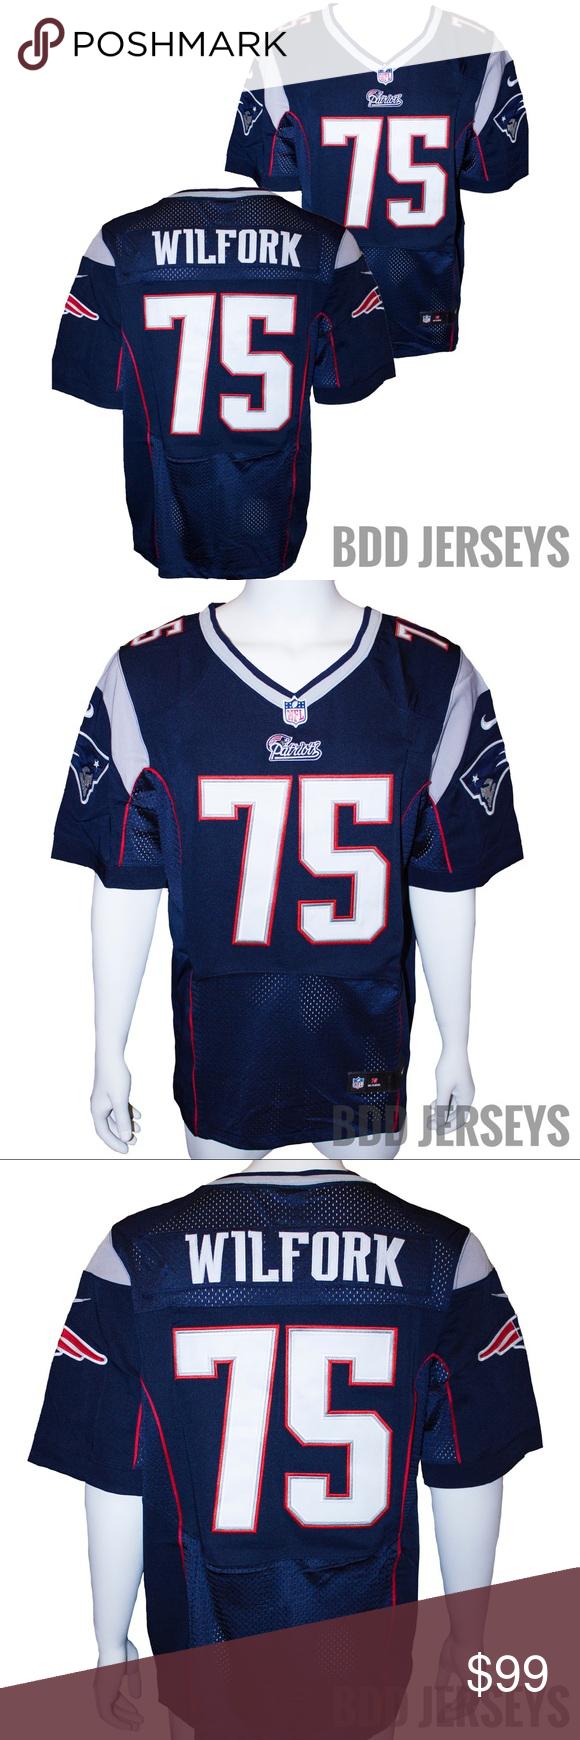 New England Patriots Vince Wilfork Jersey | New england patriots ...